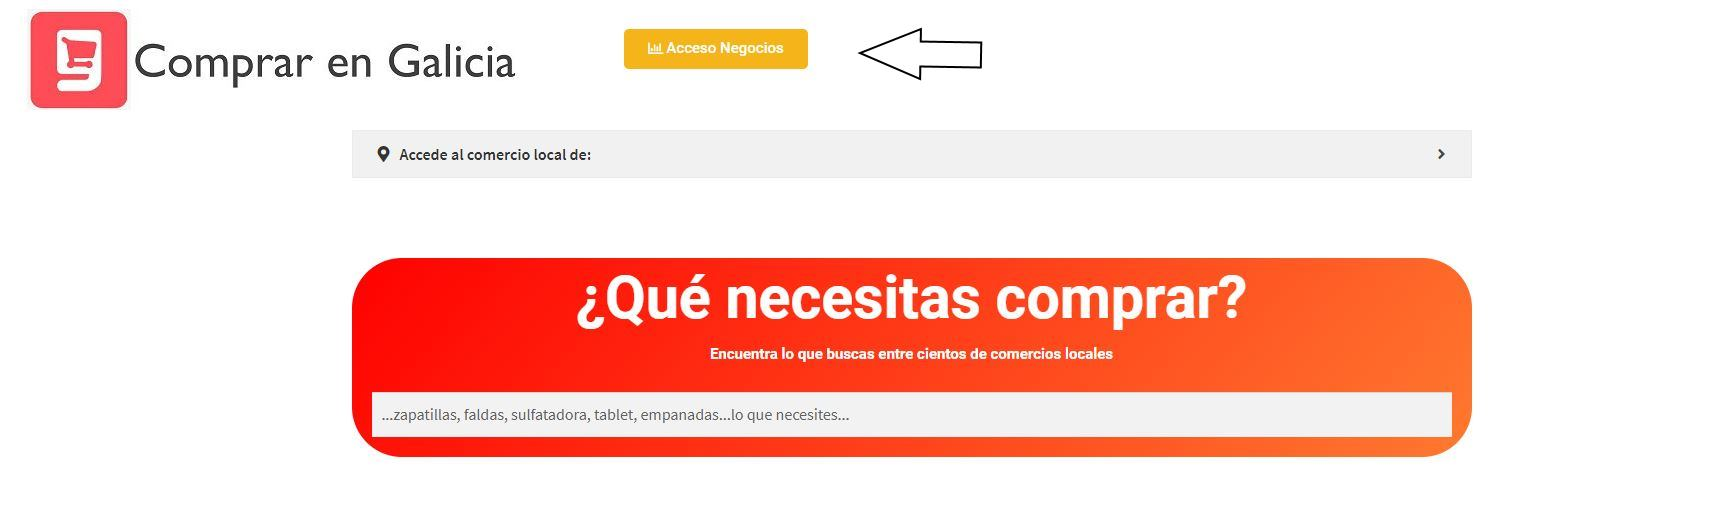 comprar en galicia acceso negocios